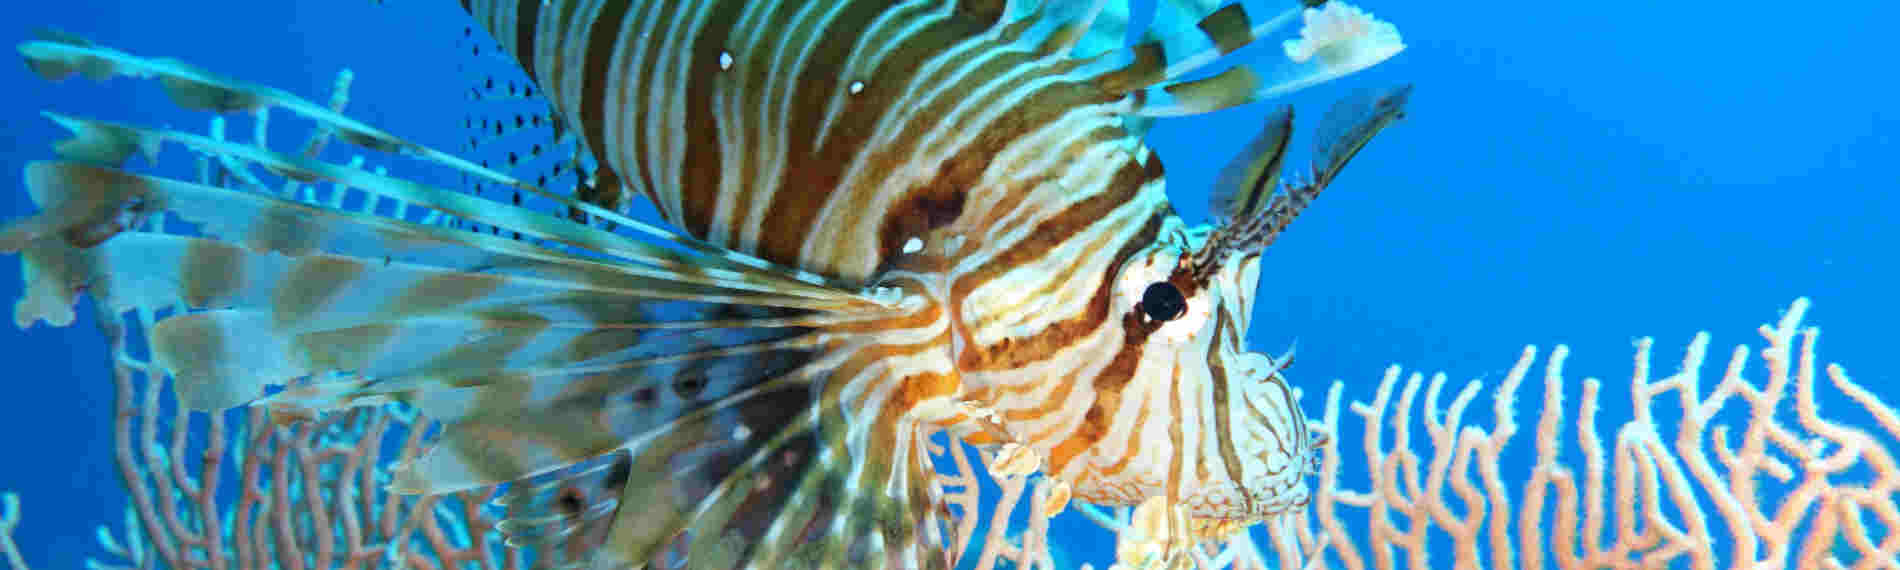 Ägypten - Dahab - Lagona Divers Nord - Rotfeuerfisch